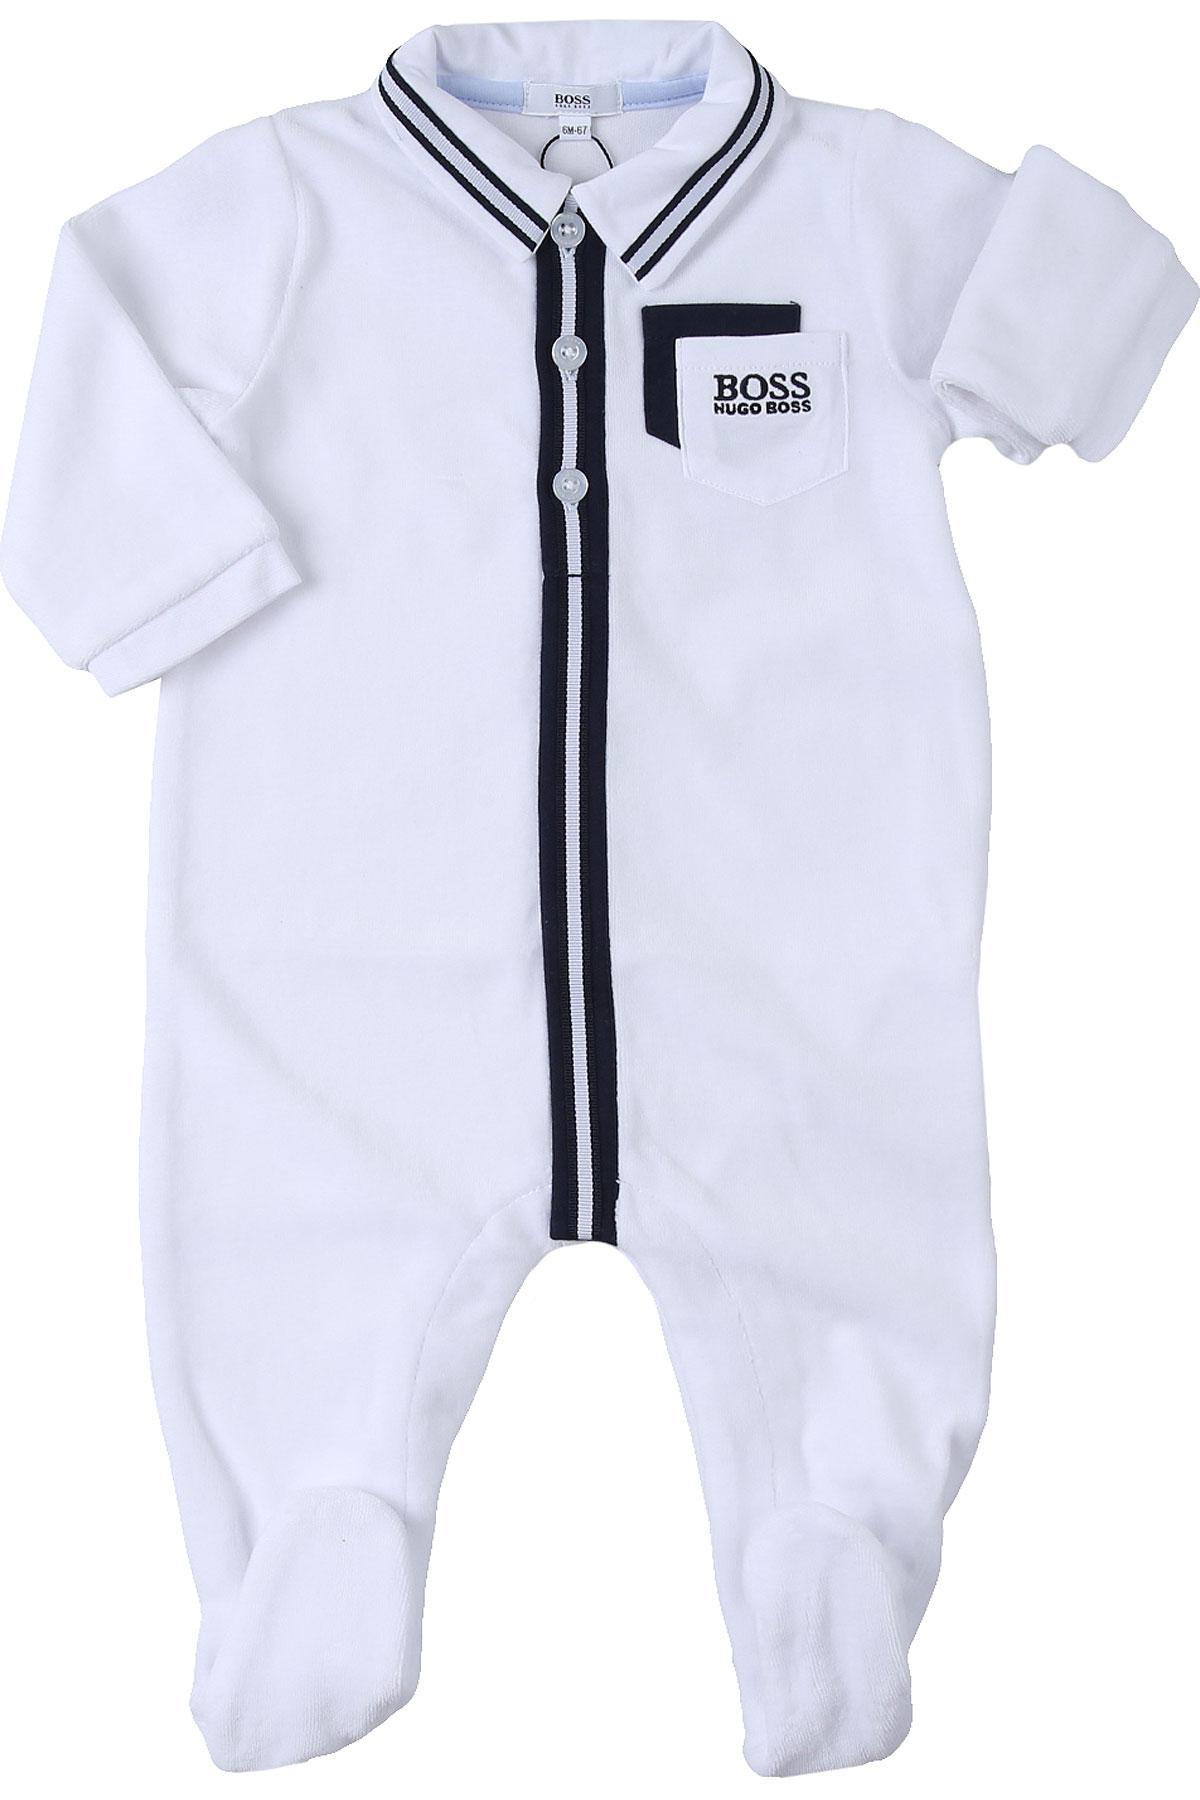 Hugo Boss Baby Bodysuits & Onesies for Boys On Sale, White, Cotton, 2019, 3M 6M